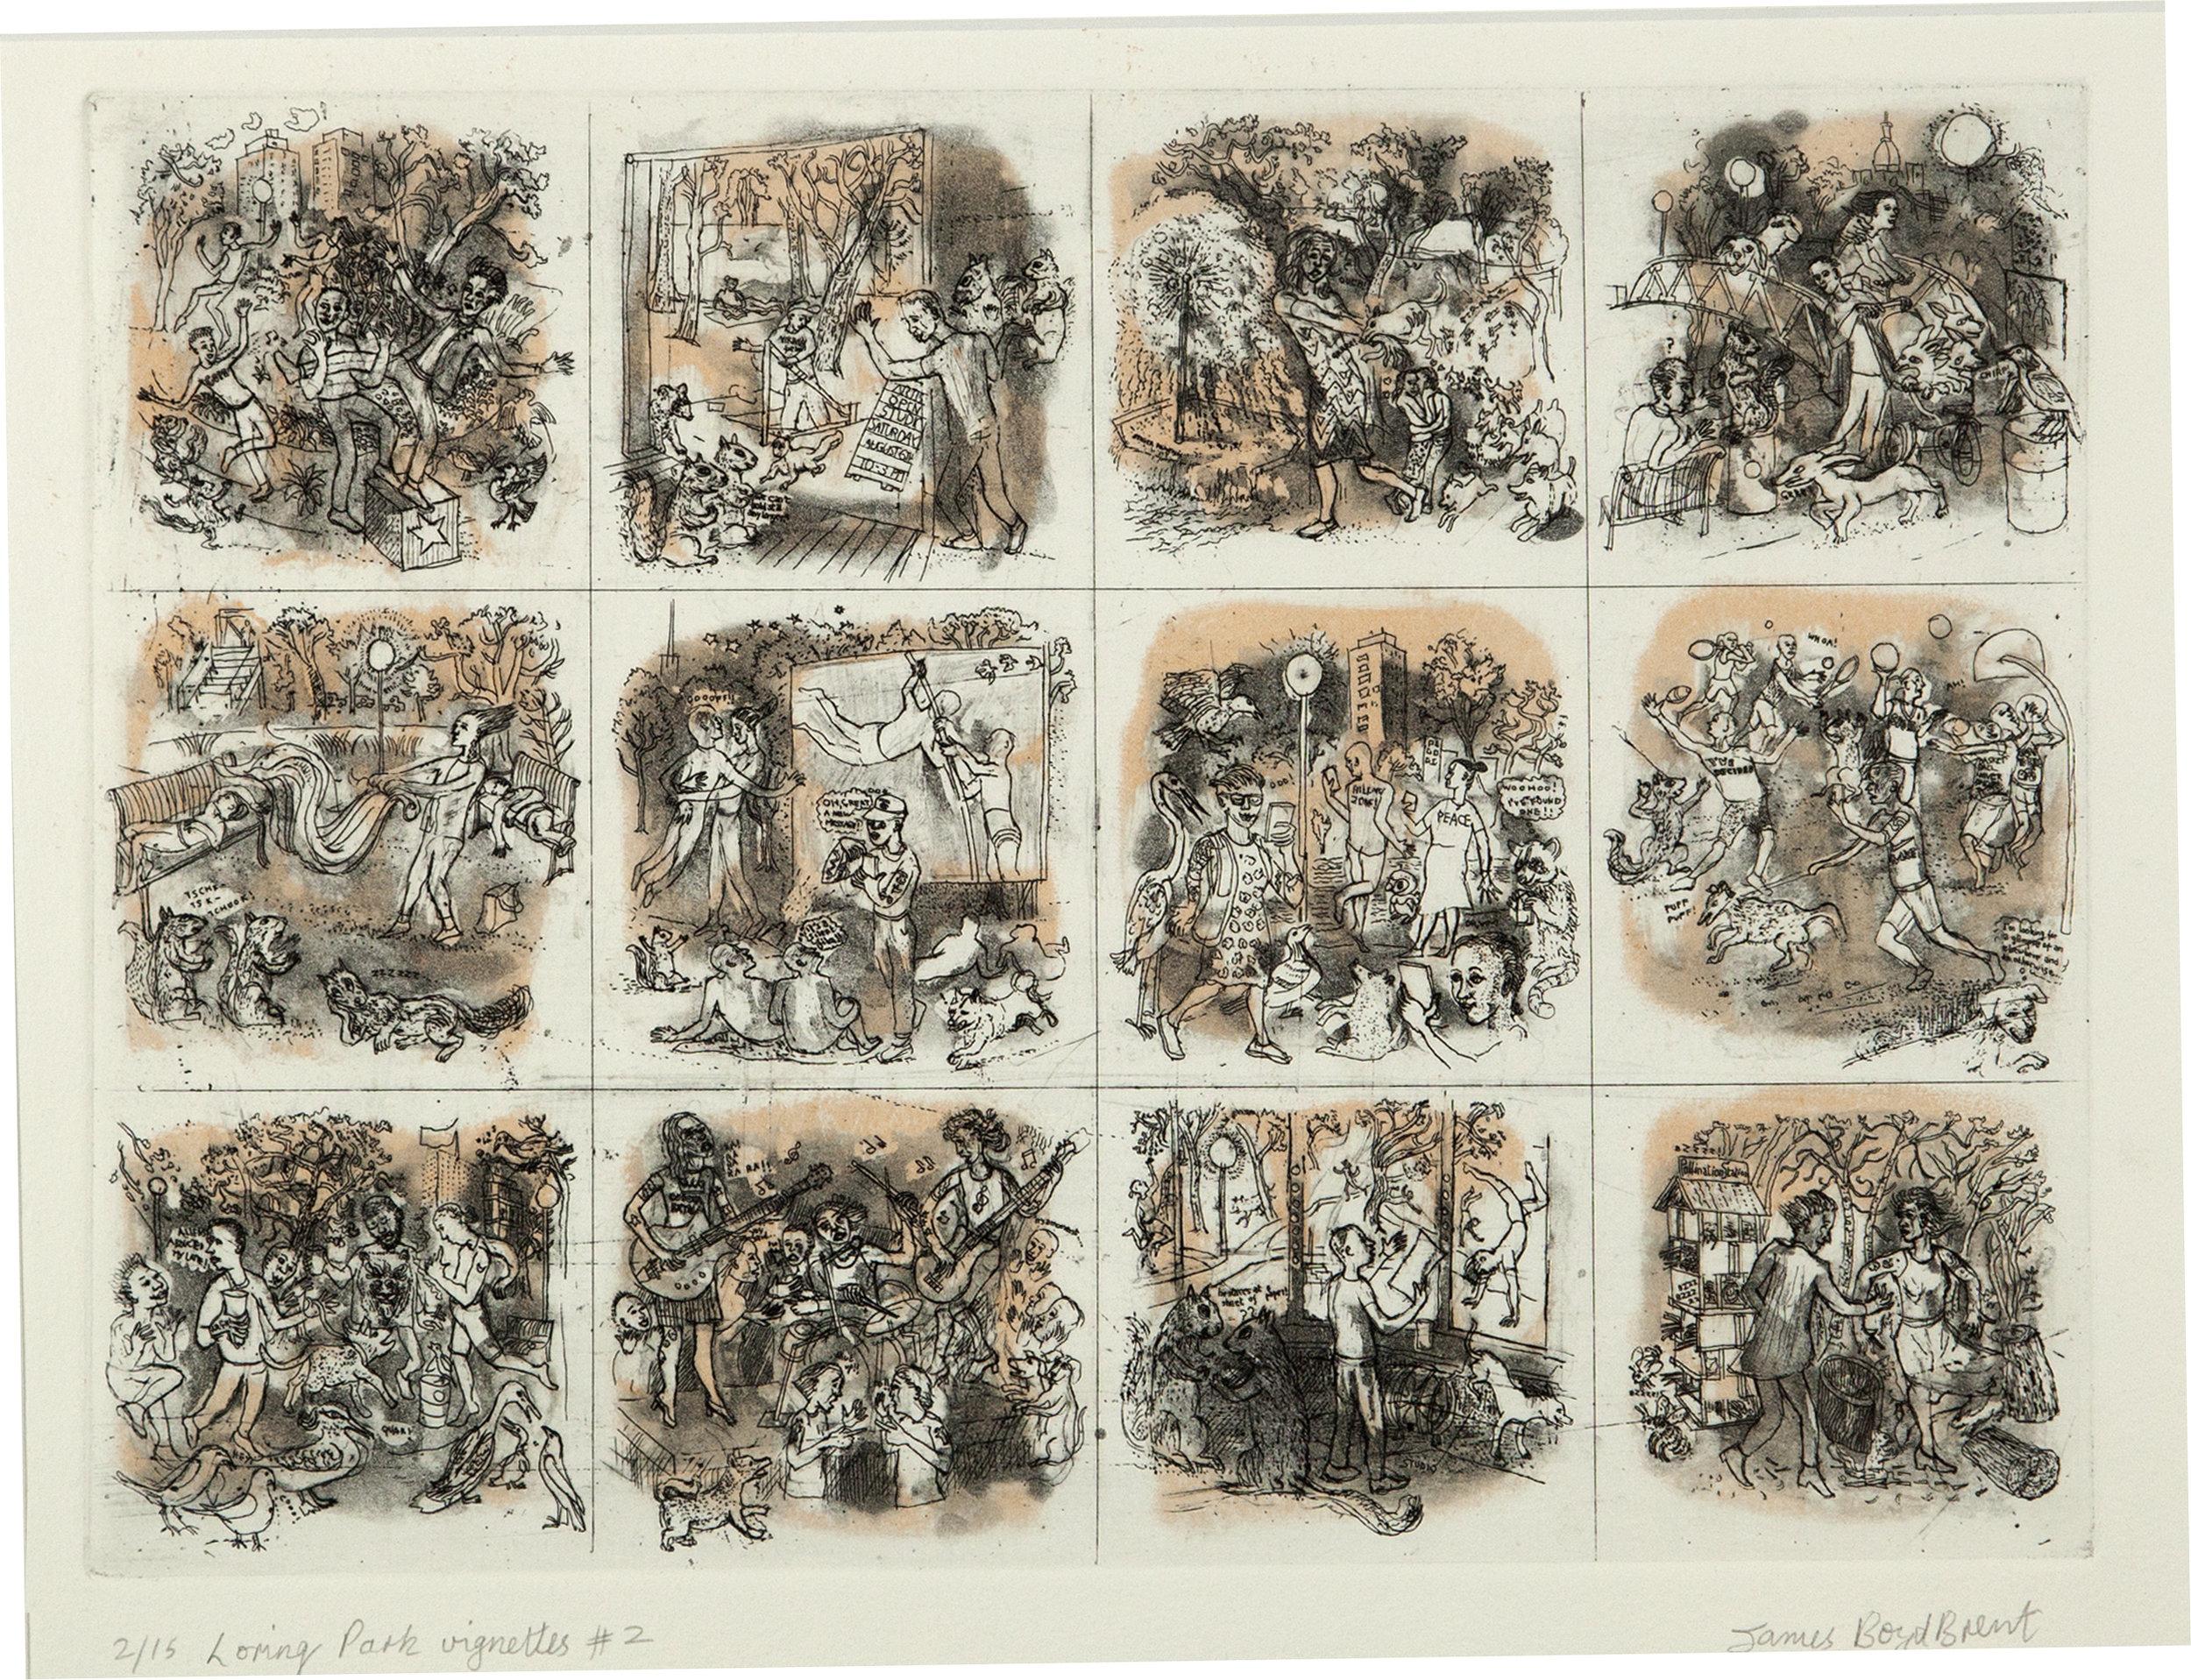 James Boyd Brent vignettes small - Copy.jpg